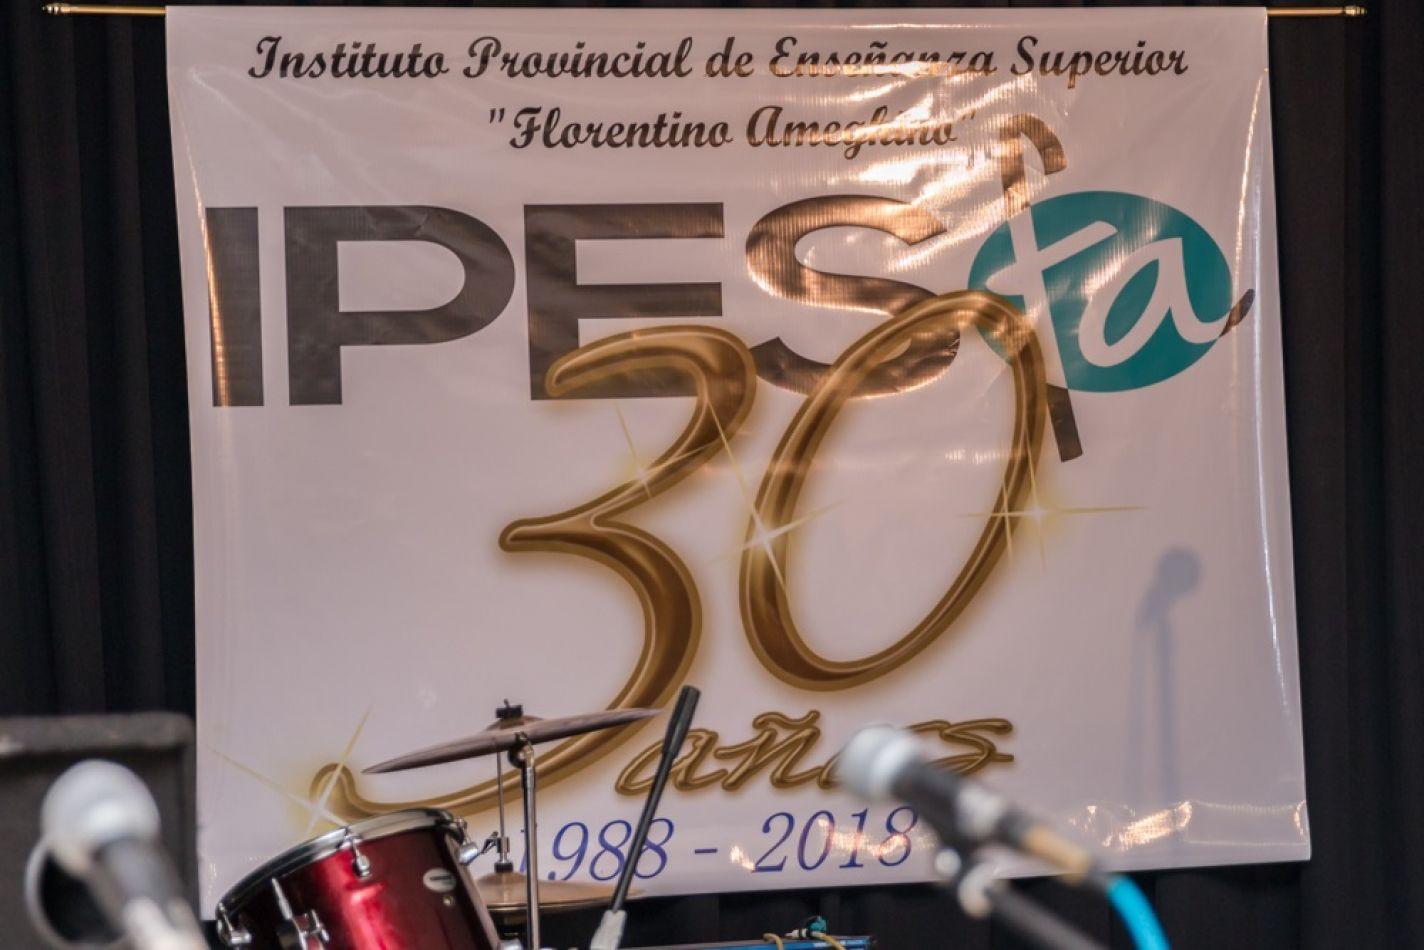 Celebraron tres décadas de vida del IPES Florentino Ameghino